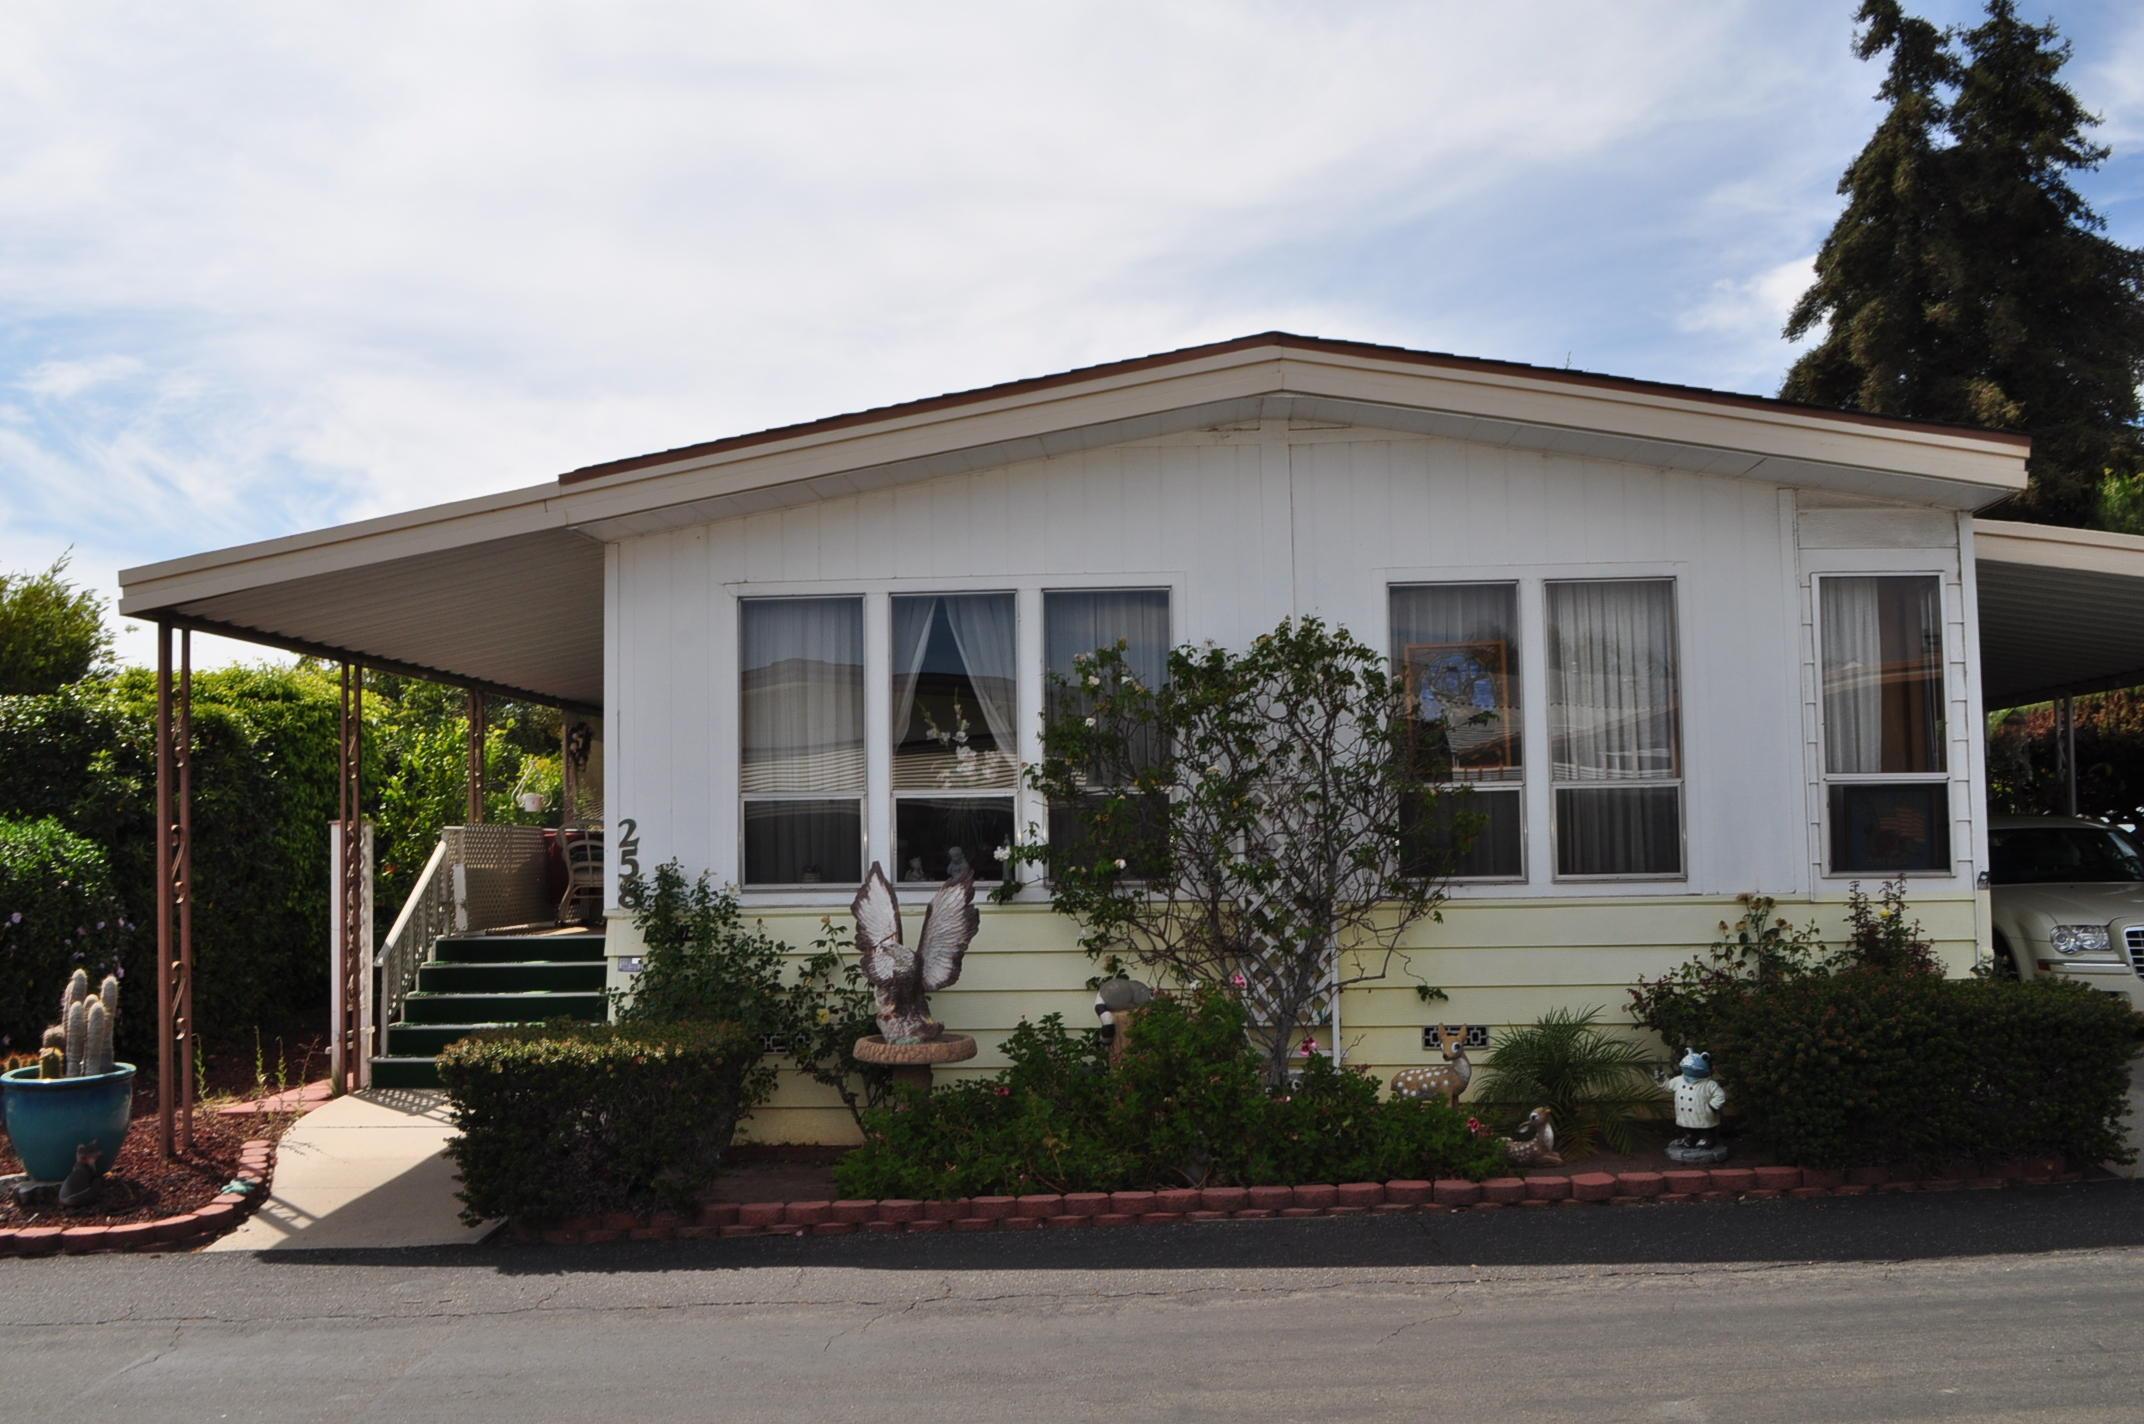 Property photo for 340 Old Mill Rd #258 Santa Barbara, California 93110 - 18-3283